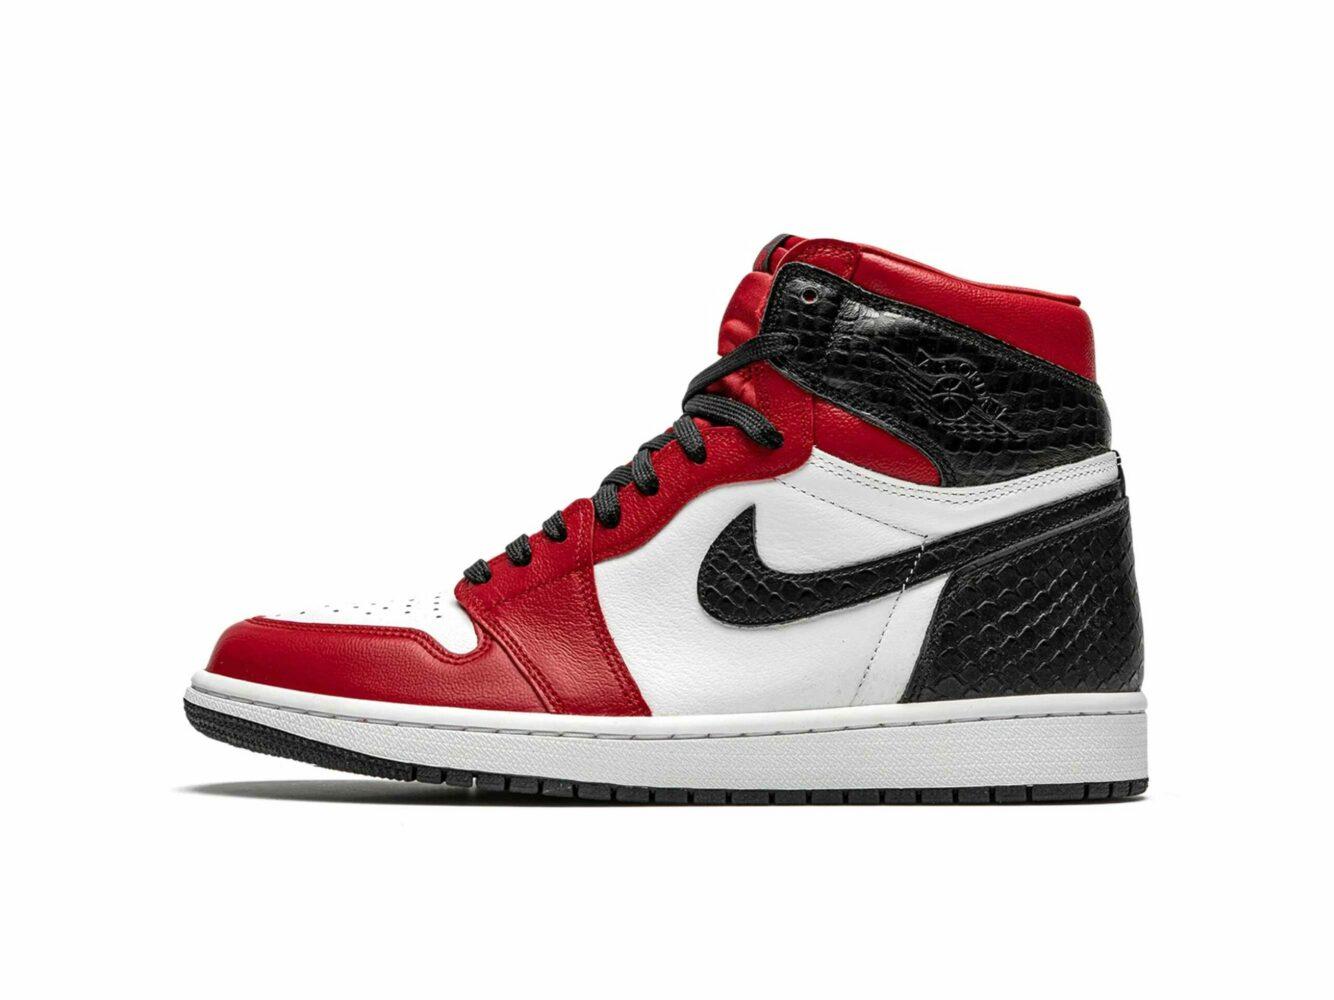 nike air Jordan 1 high retro satin snake CD0461_601 купить